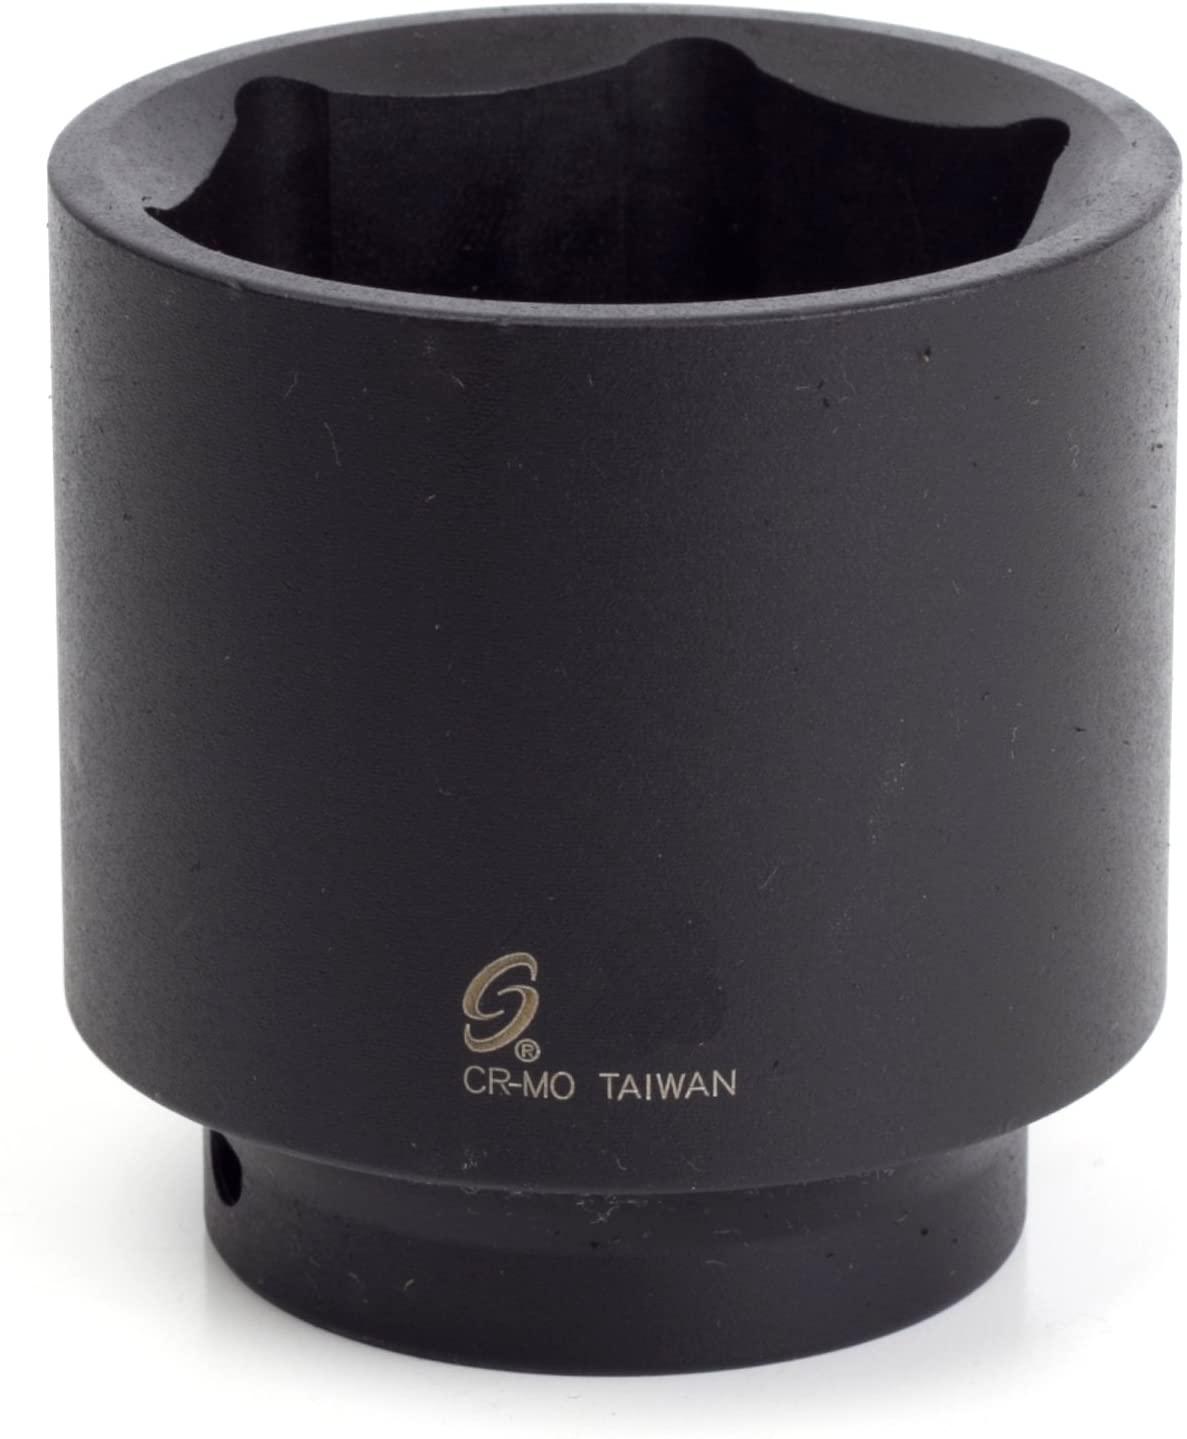 Sunex 264 1/2-Inch Drive 2-Inch Impact Socket